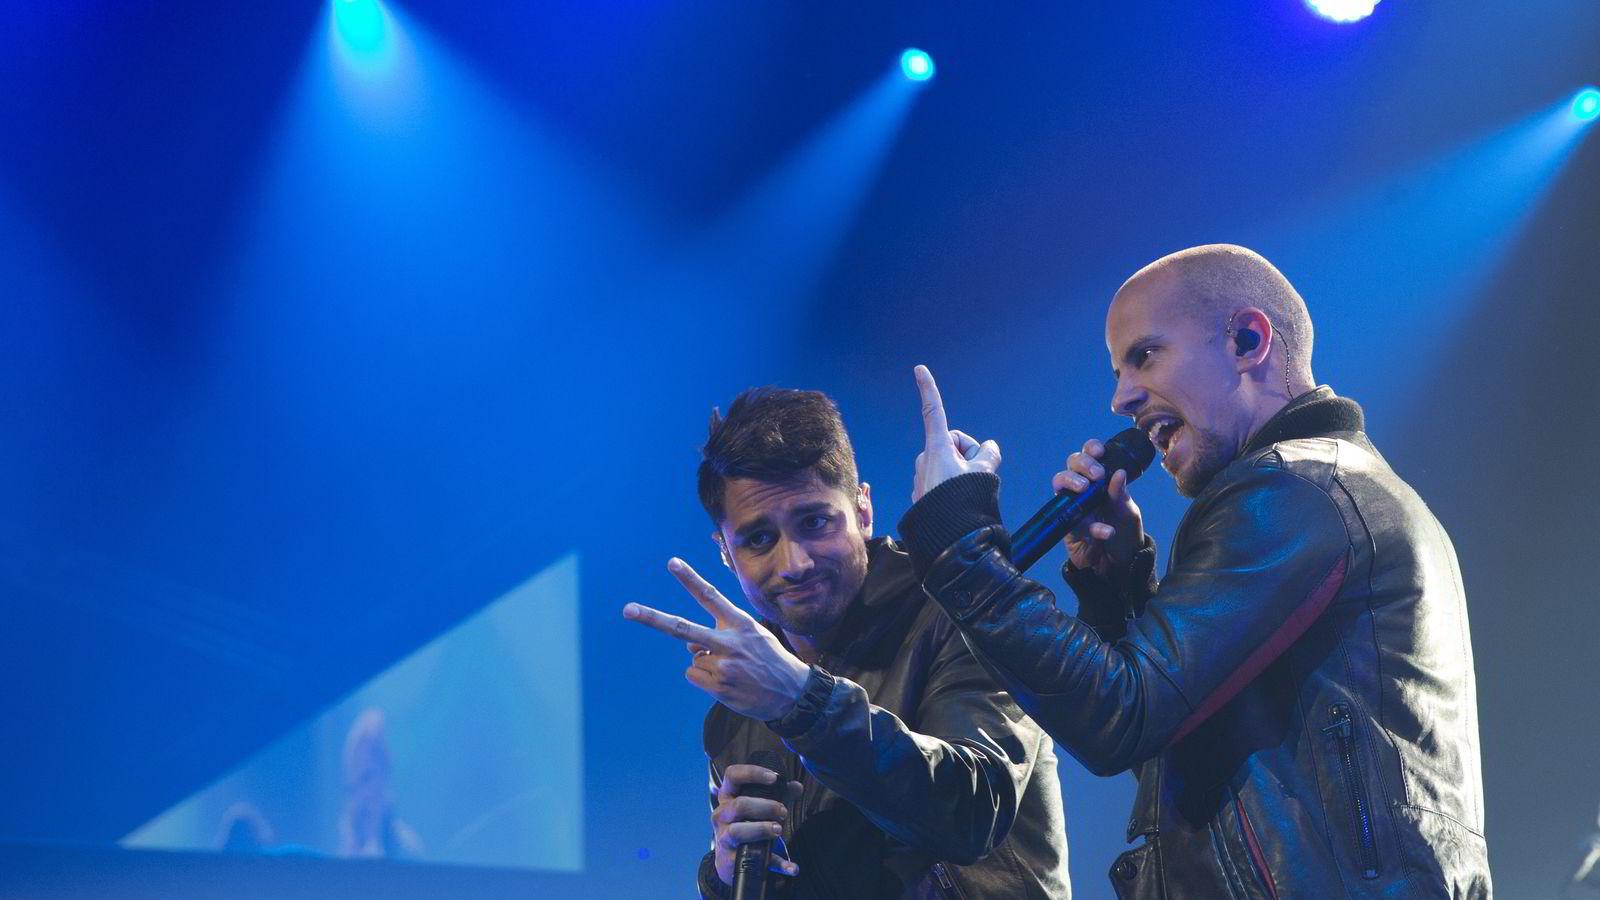 Magdi Omar Ytreeide Abdelmaguid (til venstre) og Chirag Rashmikant Patel i Oslo Spektrum i 2013. Foto: Terje Bendiksby /